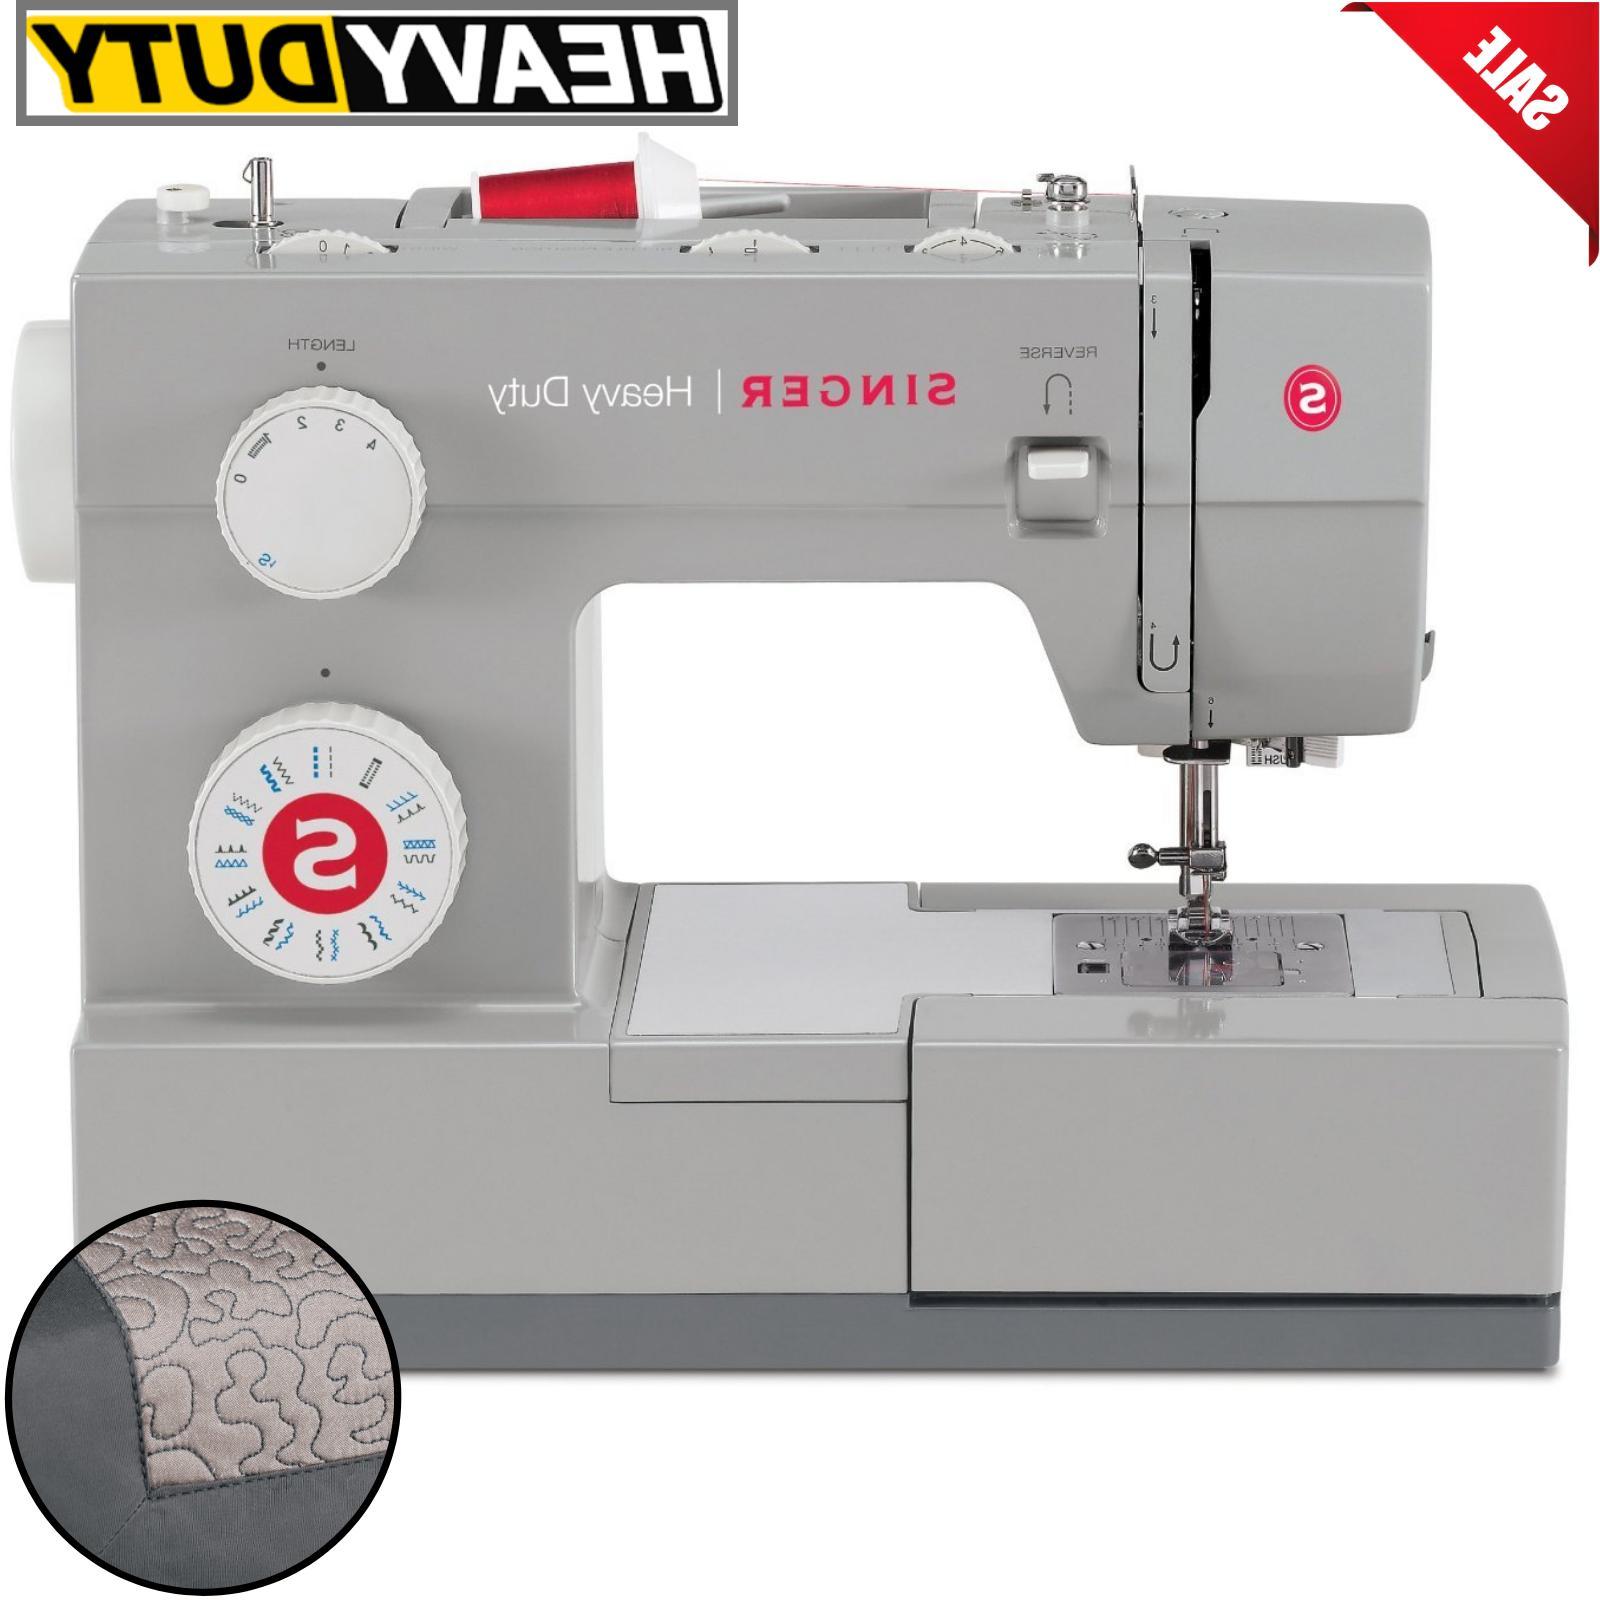 sewing machine 4423 model heavy duty mechanical